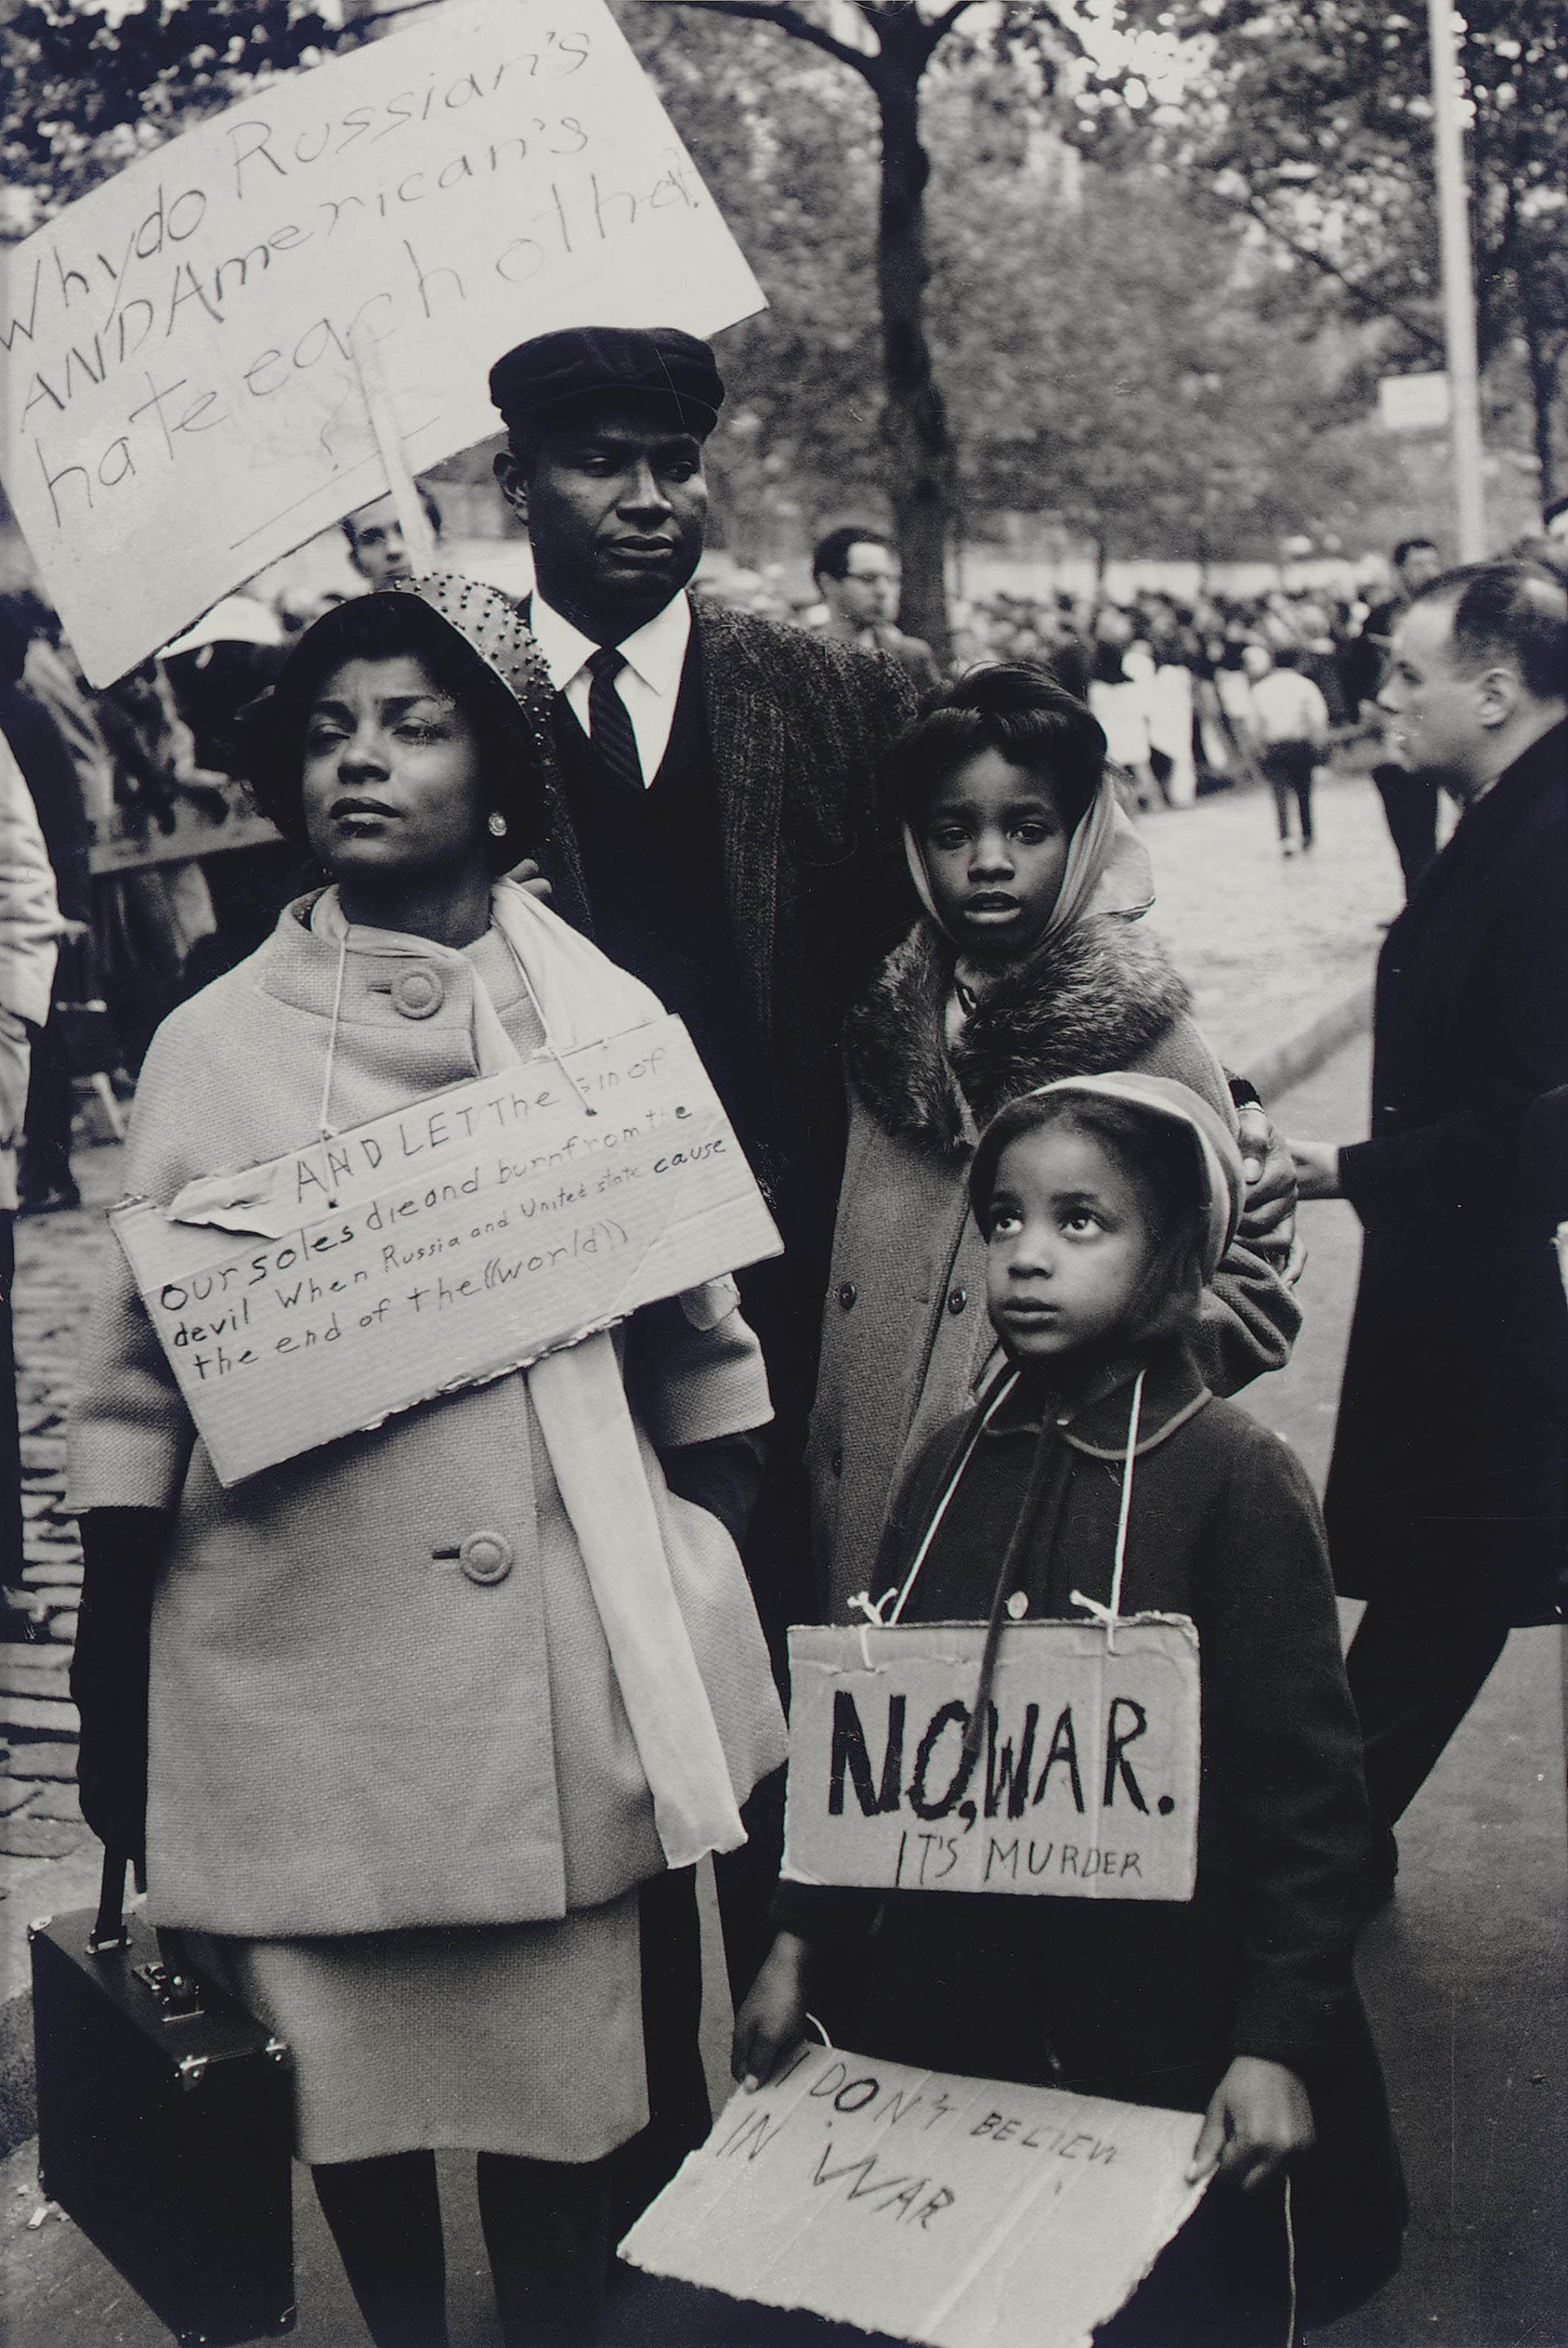 Protest, Cuban Missile Crisis, 1962